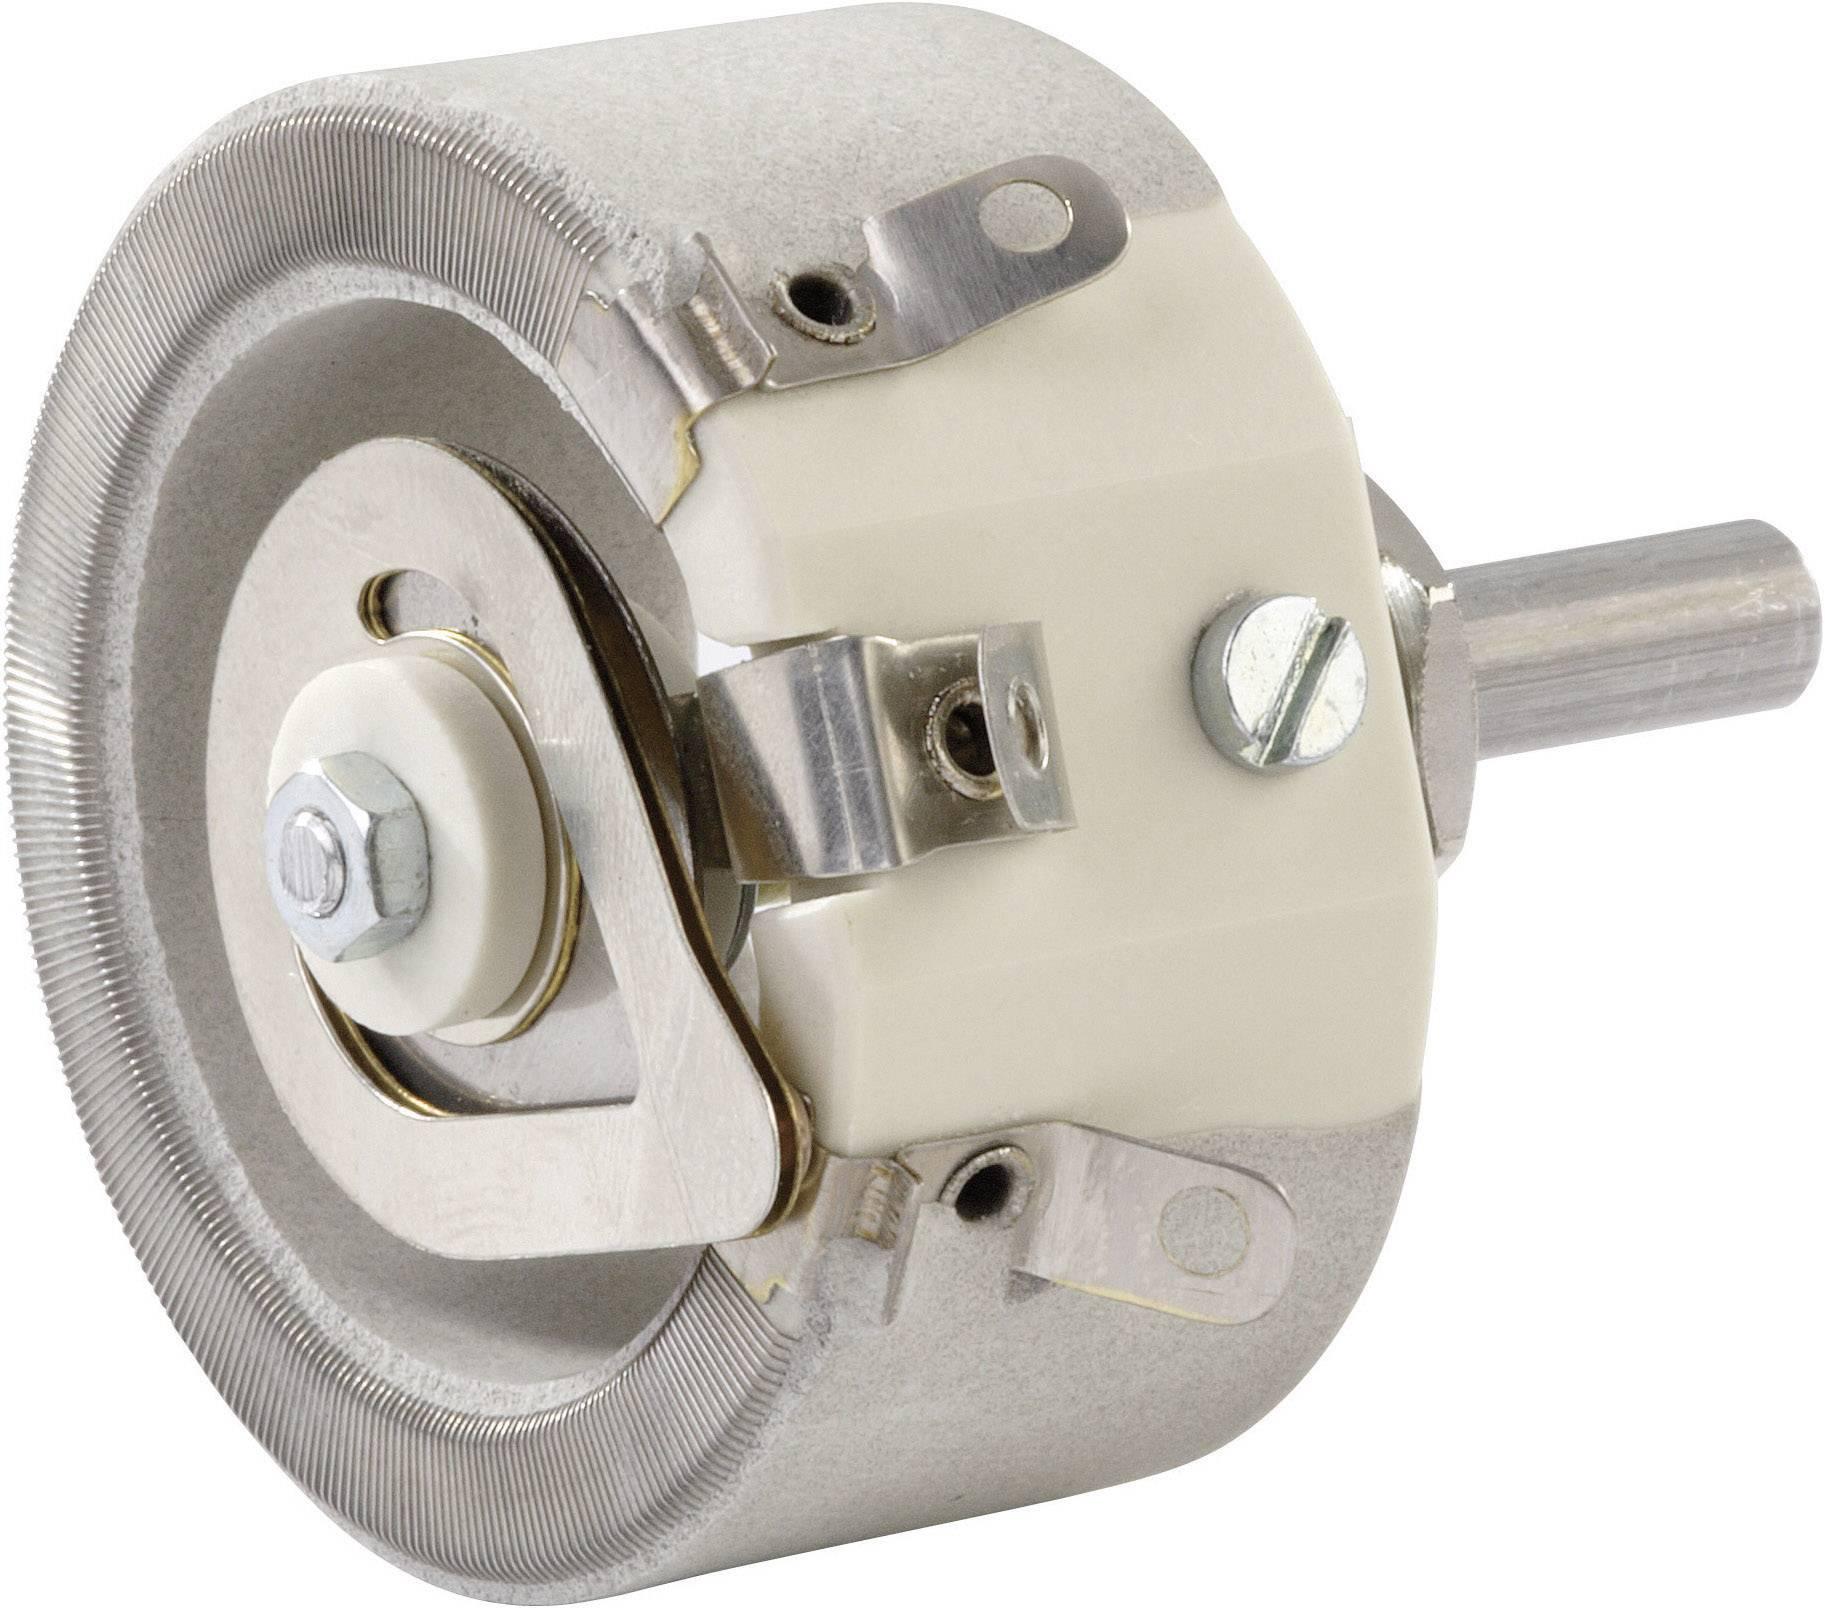 Drátový potenciometr Mono TT Electronics AB 3191102700 3191102700, 30 W, 22 Ohm, 1 ks